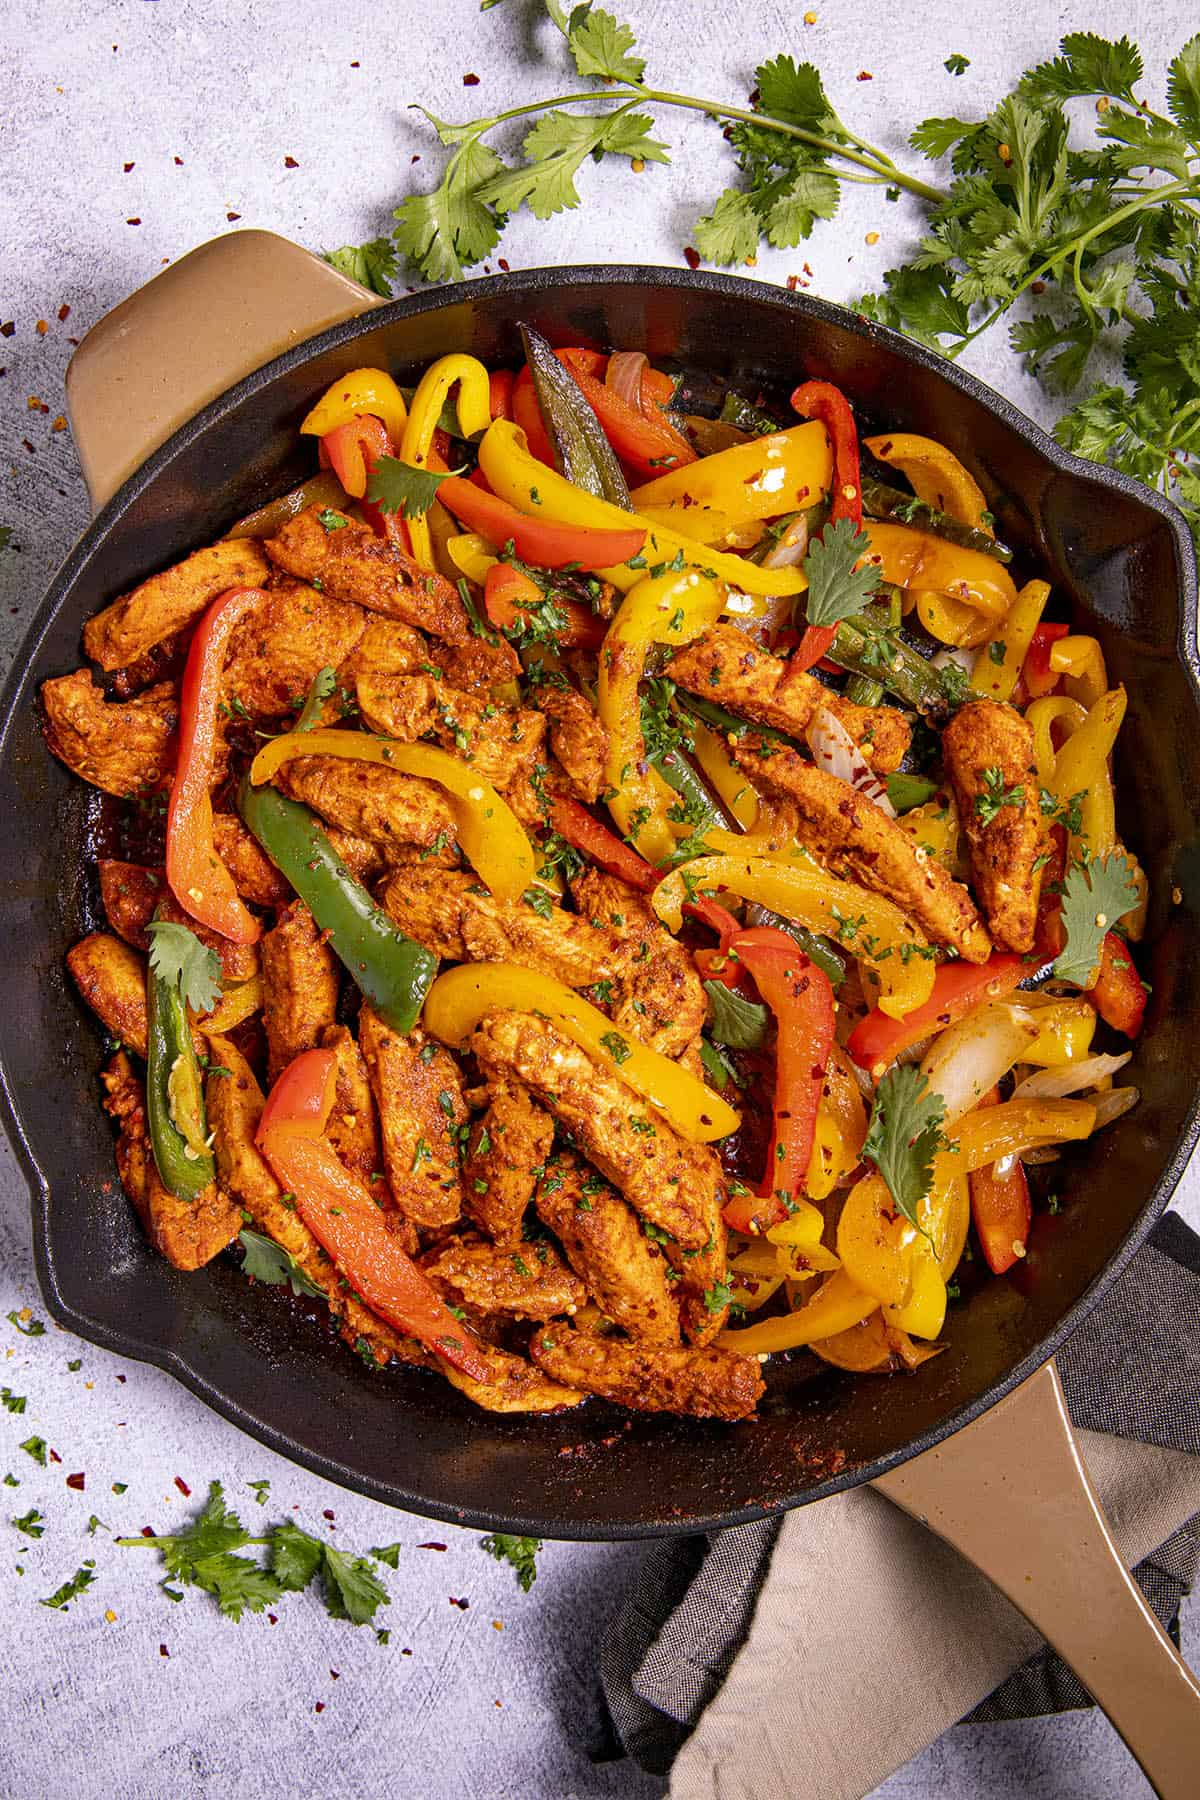 Chicken Fajitas in a pan, ready to serve